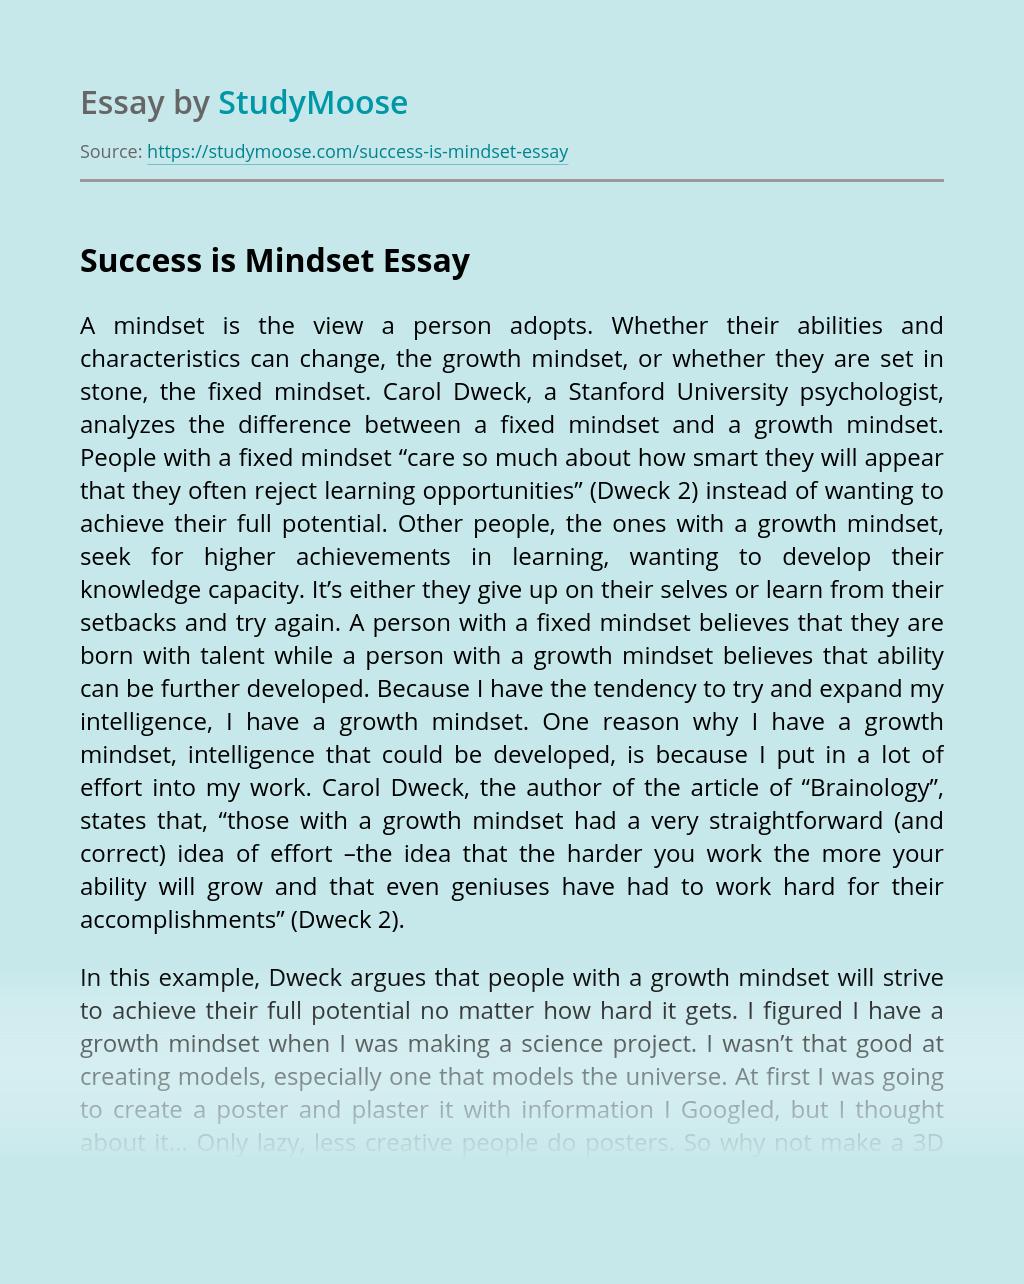 Success is Mindset